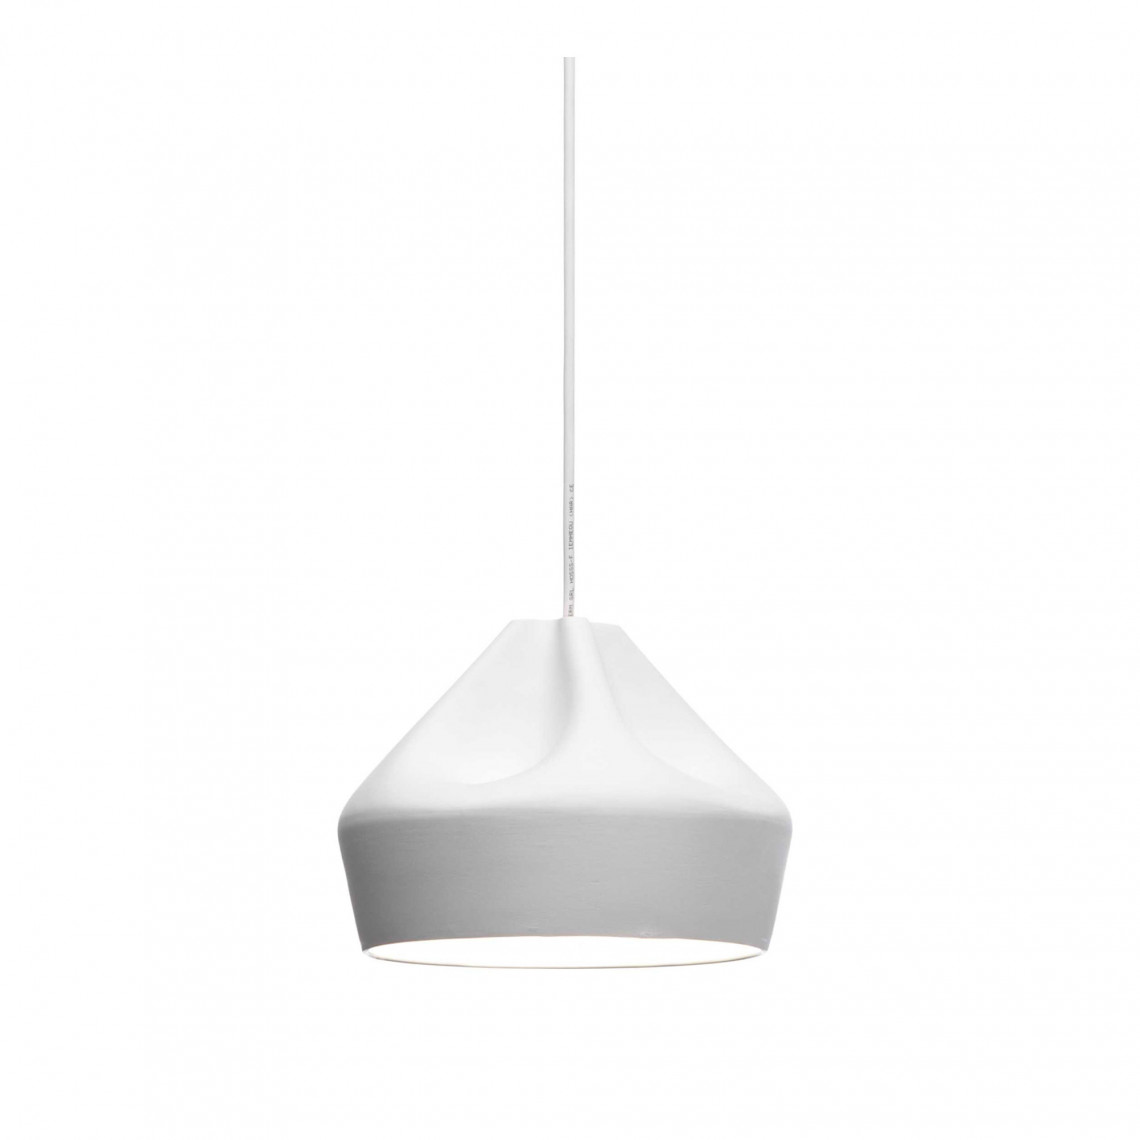 Pleat Box 24 - Pendant Lamp White/White